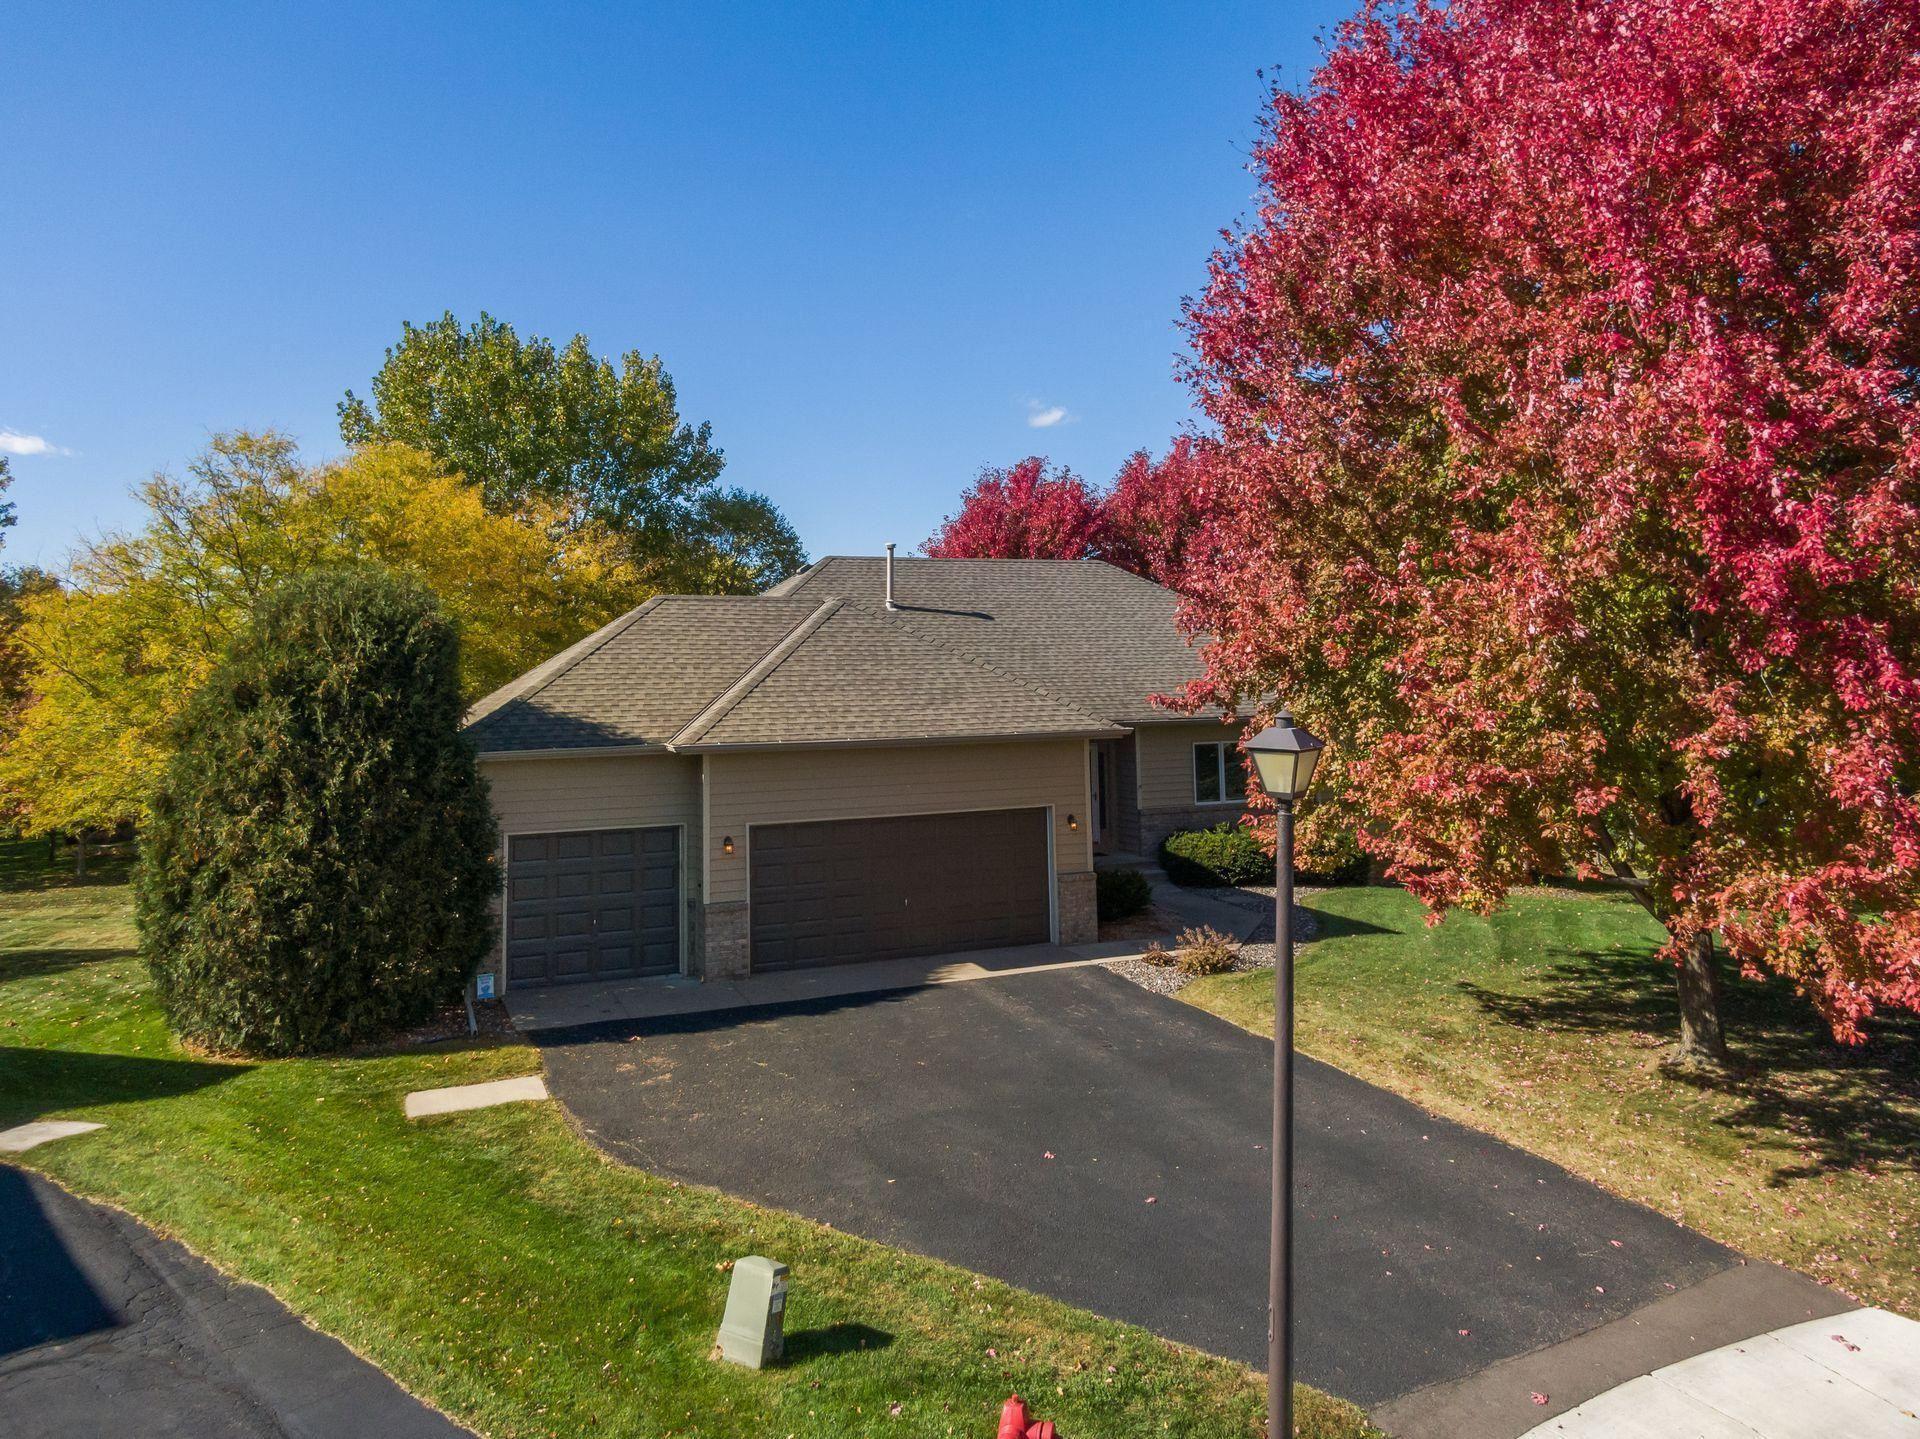 18926 Yarborough Terrace, Maple Grove, MN 55311 - MLS#: 5574595